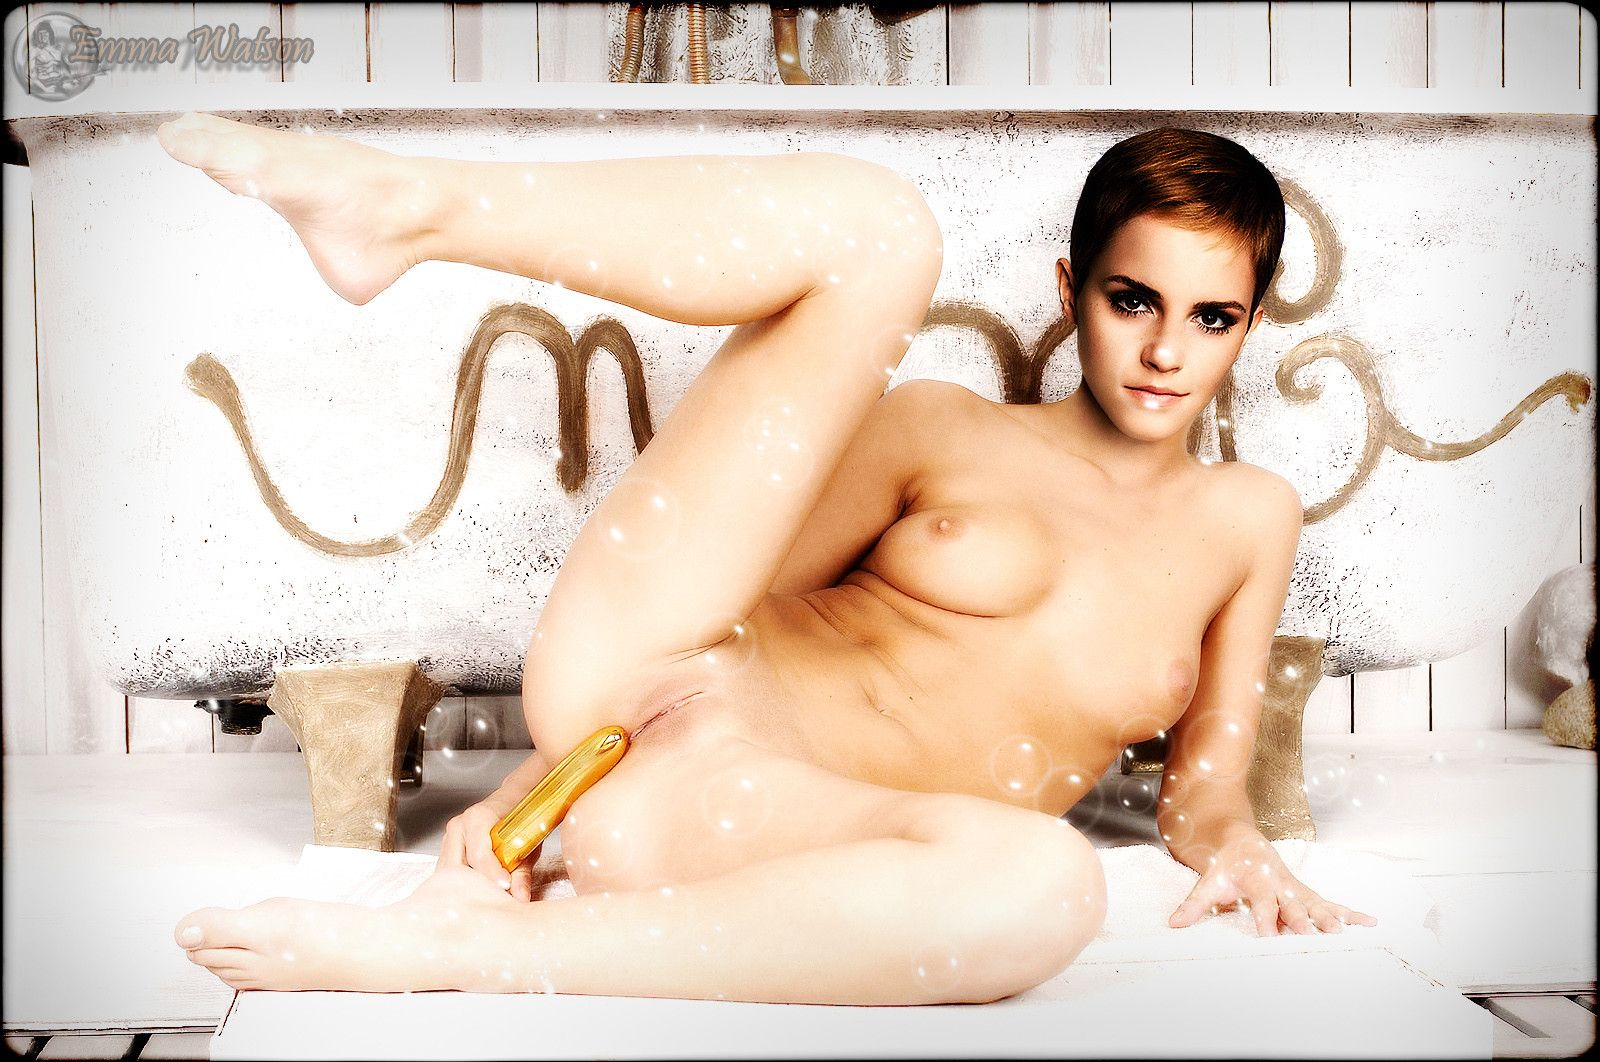 Emma Watson Rubbing Dildo Pussy